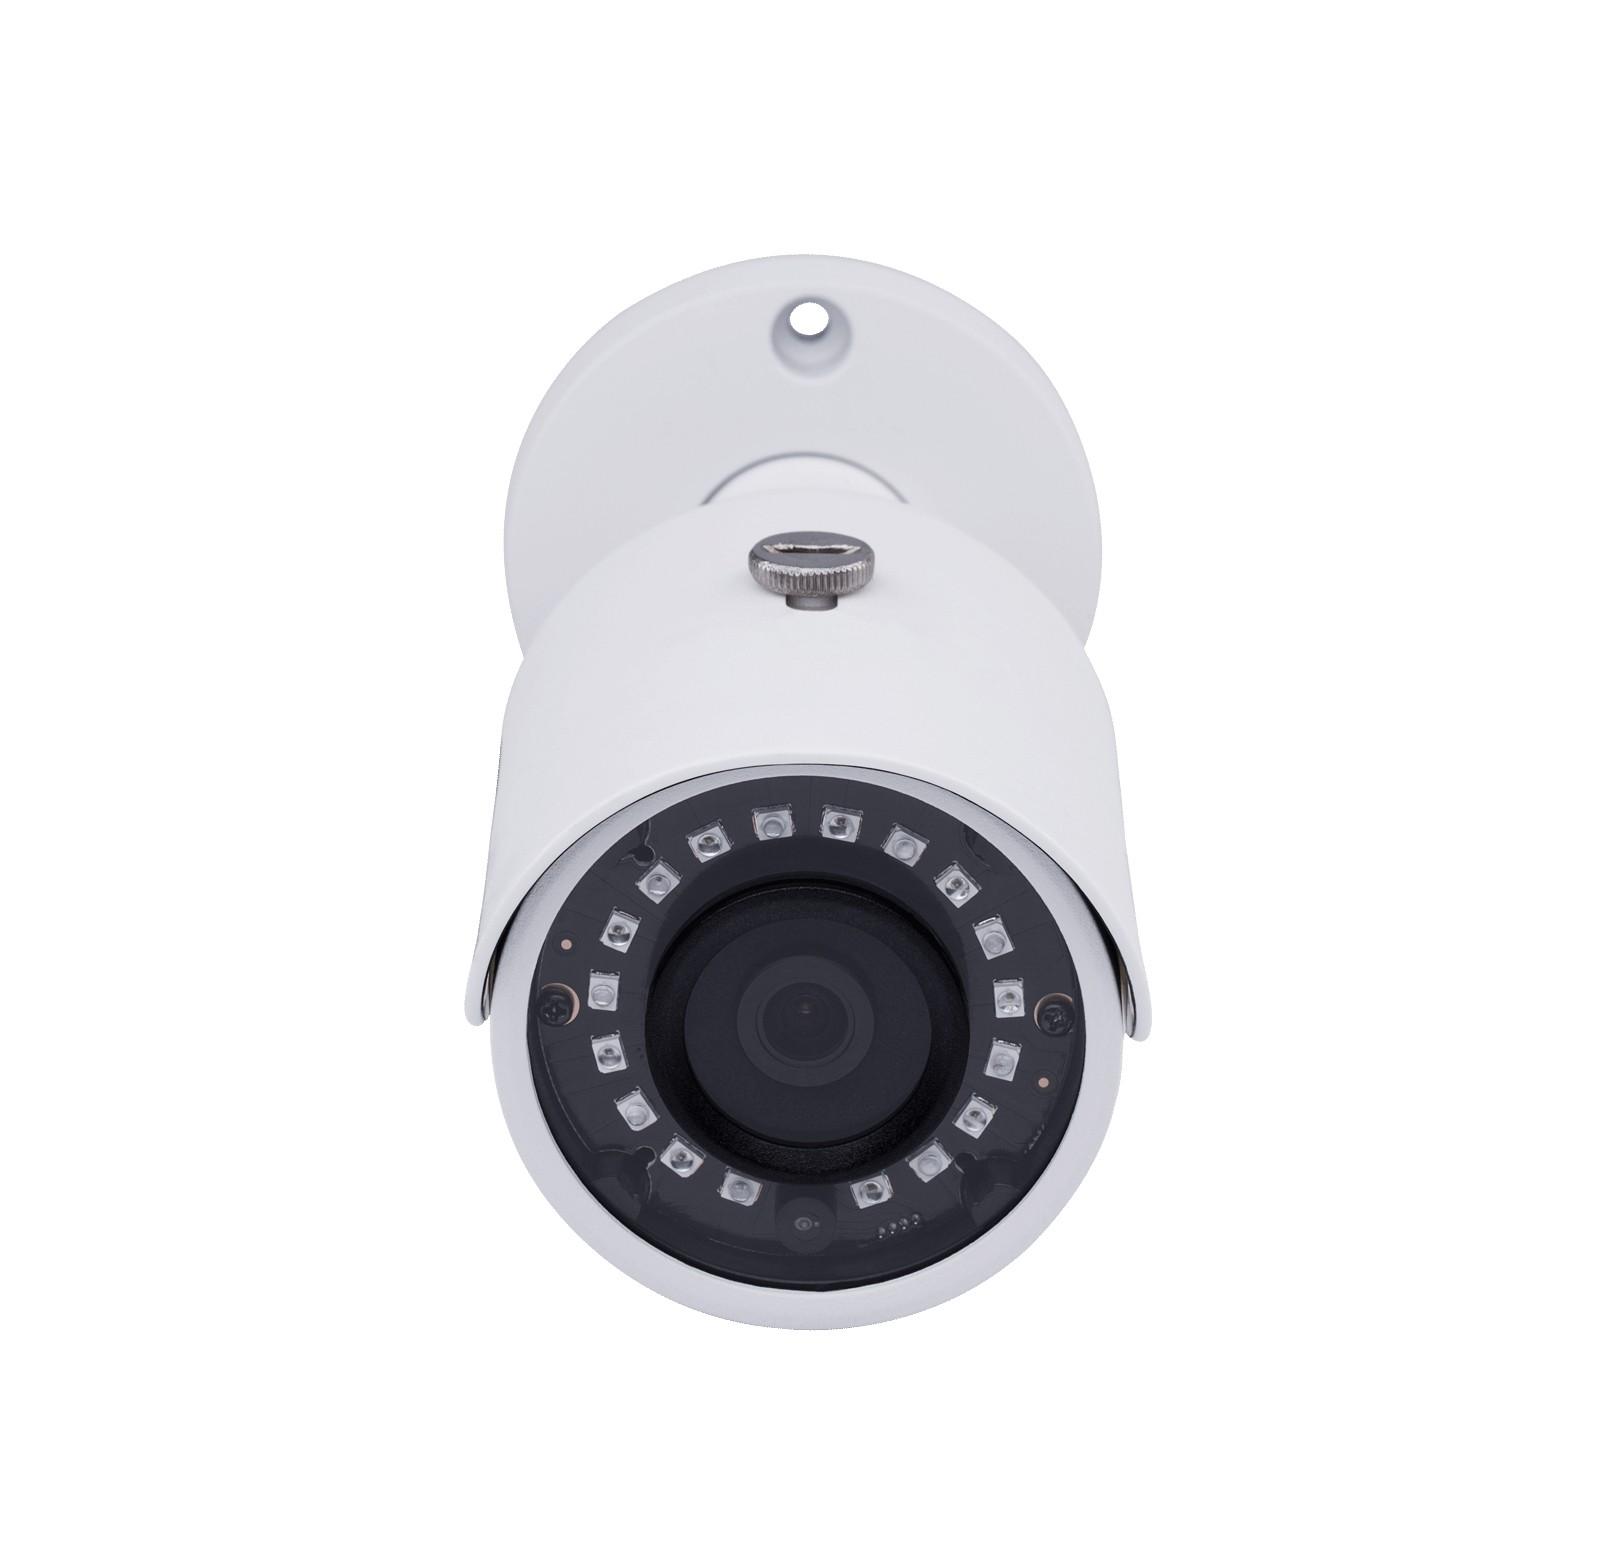 Câmera Intelbras Bullet VHD 5240 StarLight Full HD Sony Starvis (2.0MP   1080P   3.6mm   Metal)  - CFTV Clube   Brasil